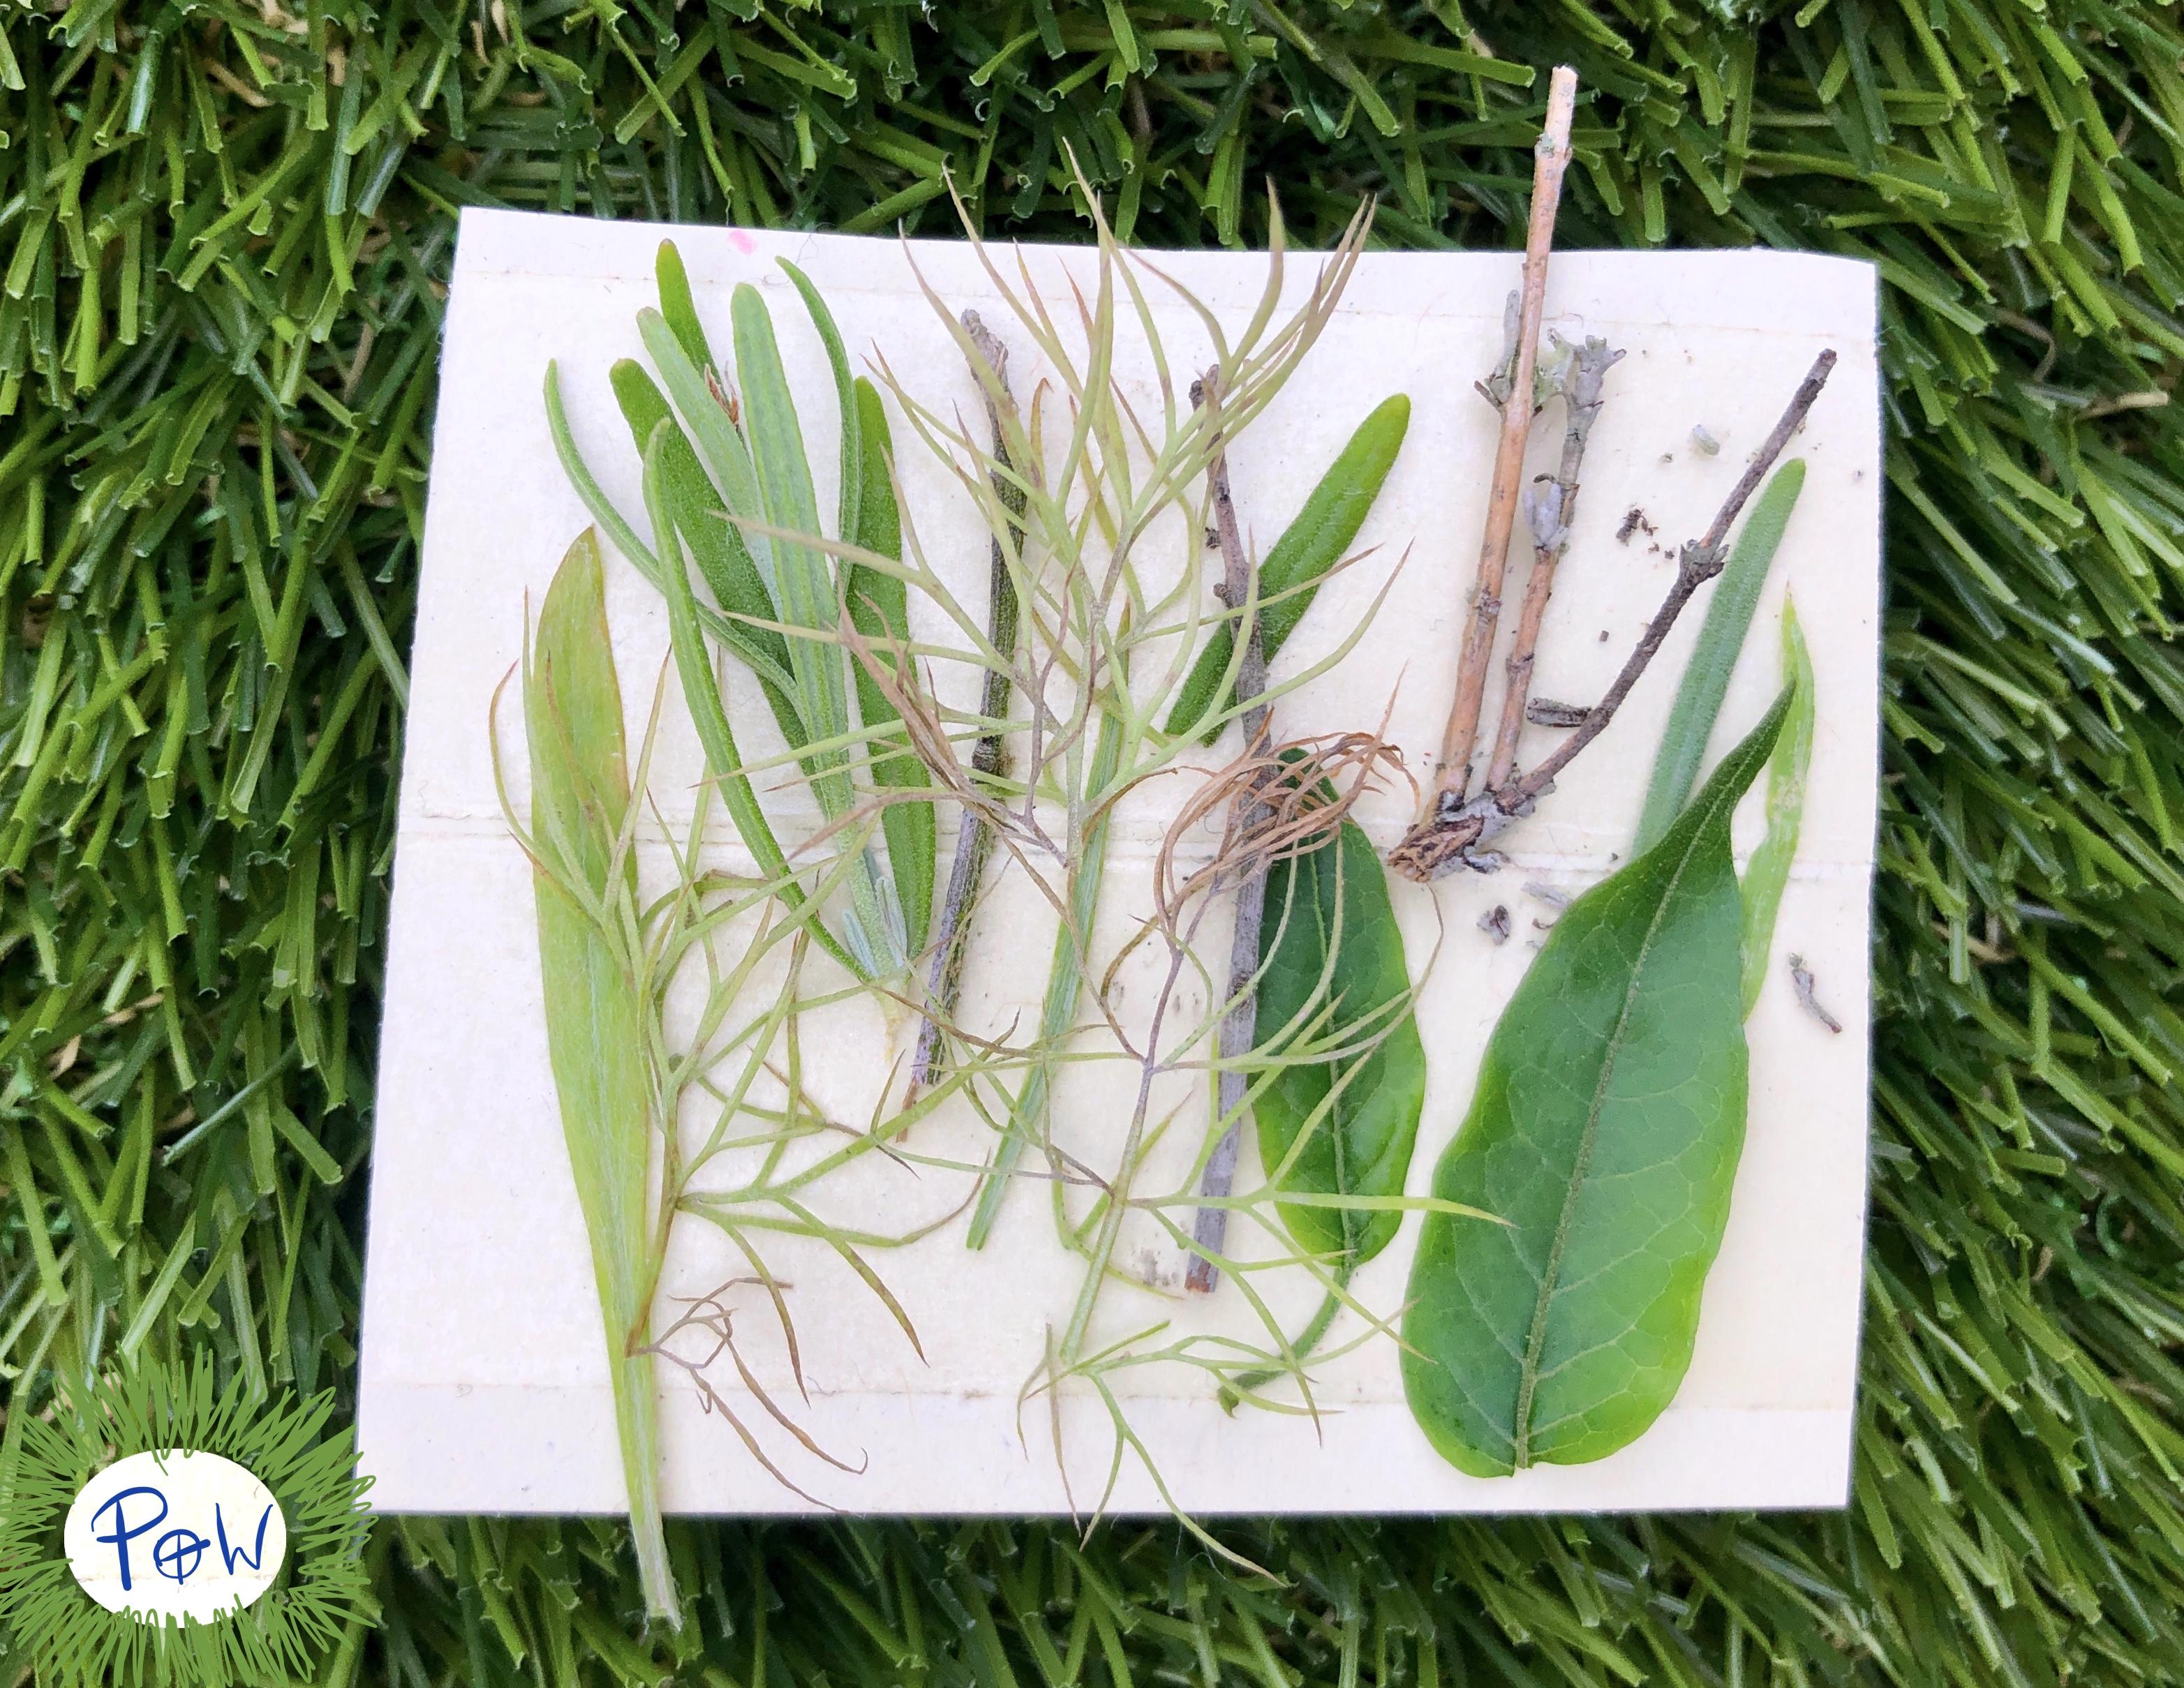 Outdoor Nature Art Activity for children. Miniature art collage.